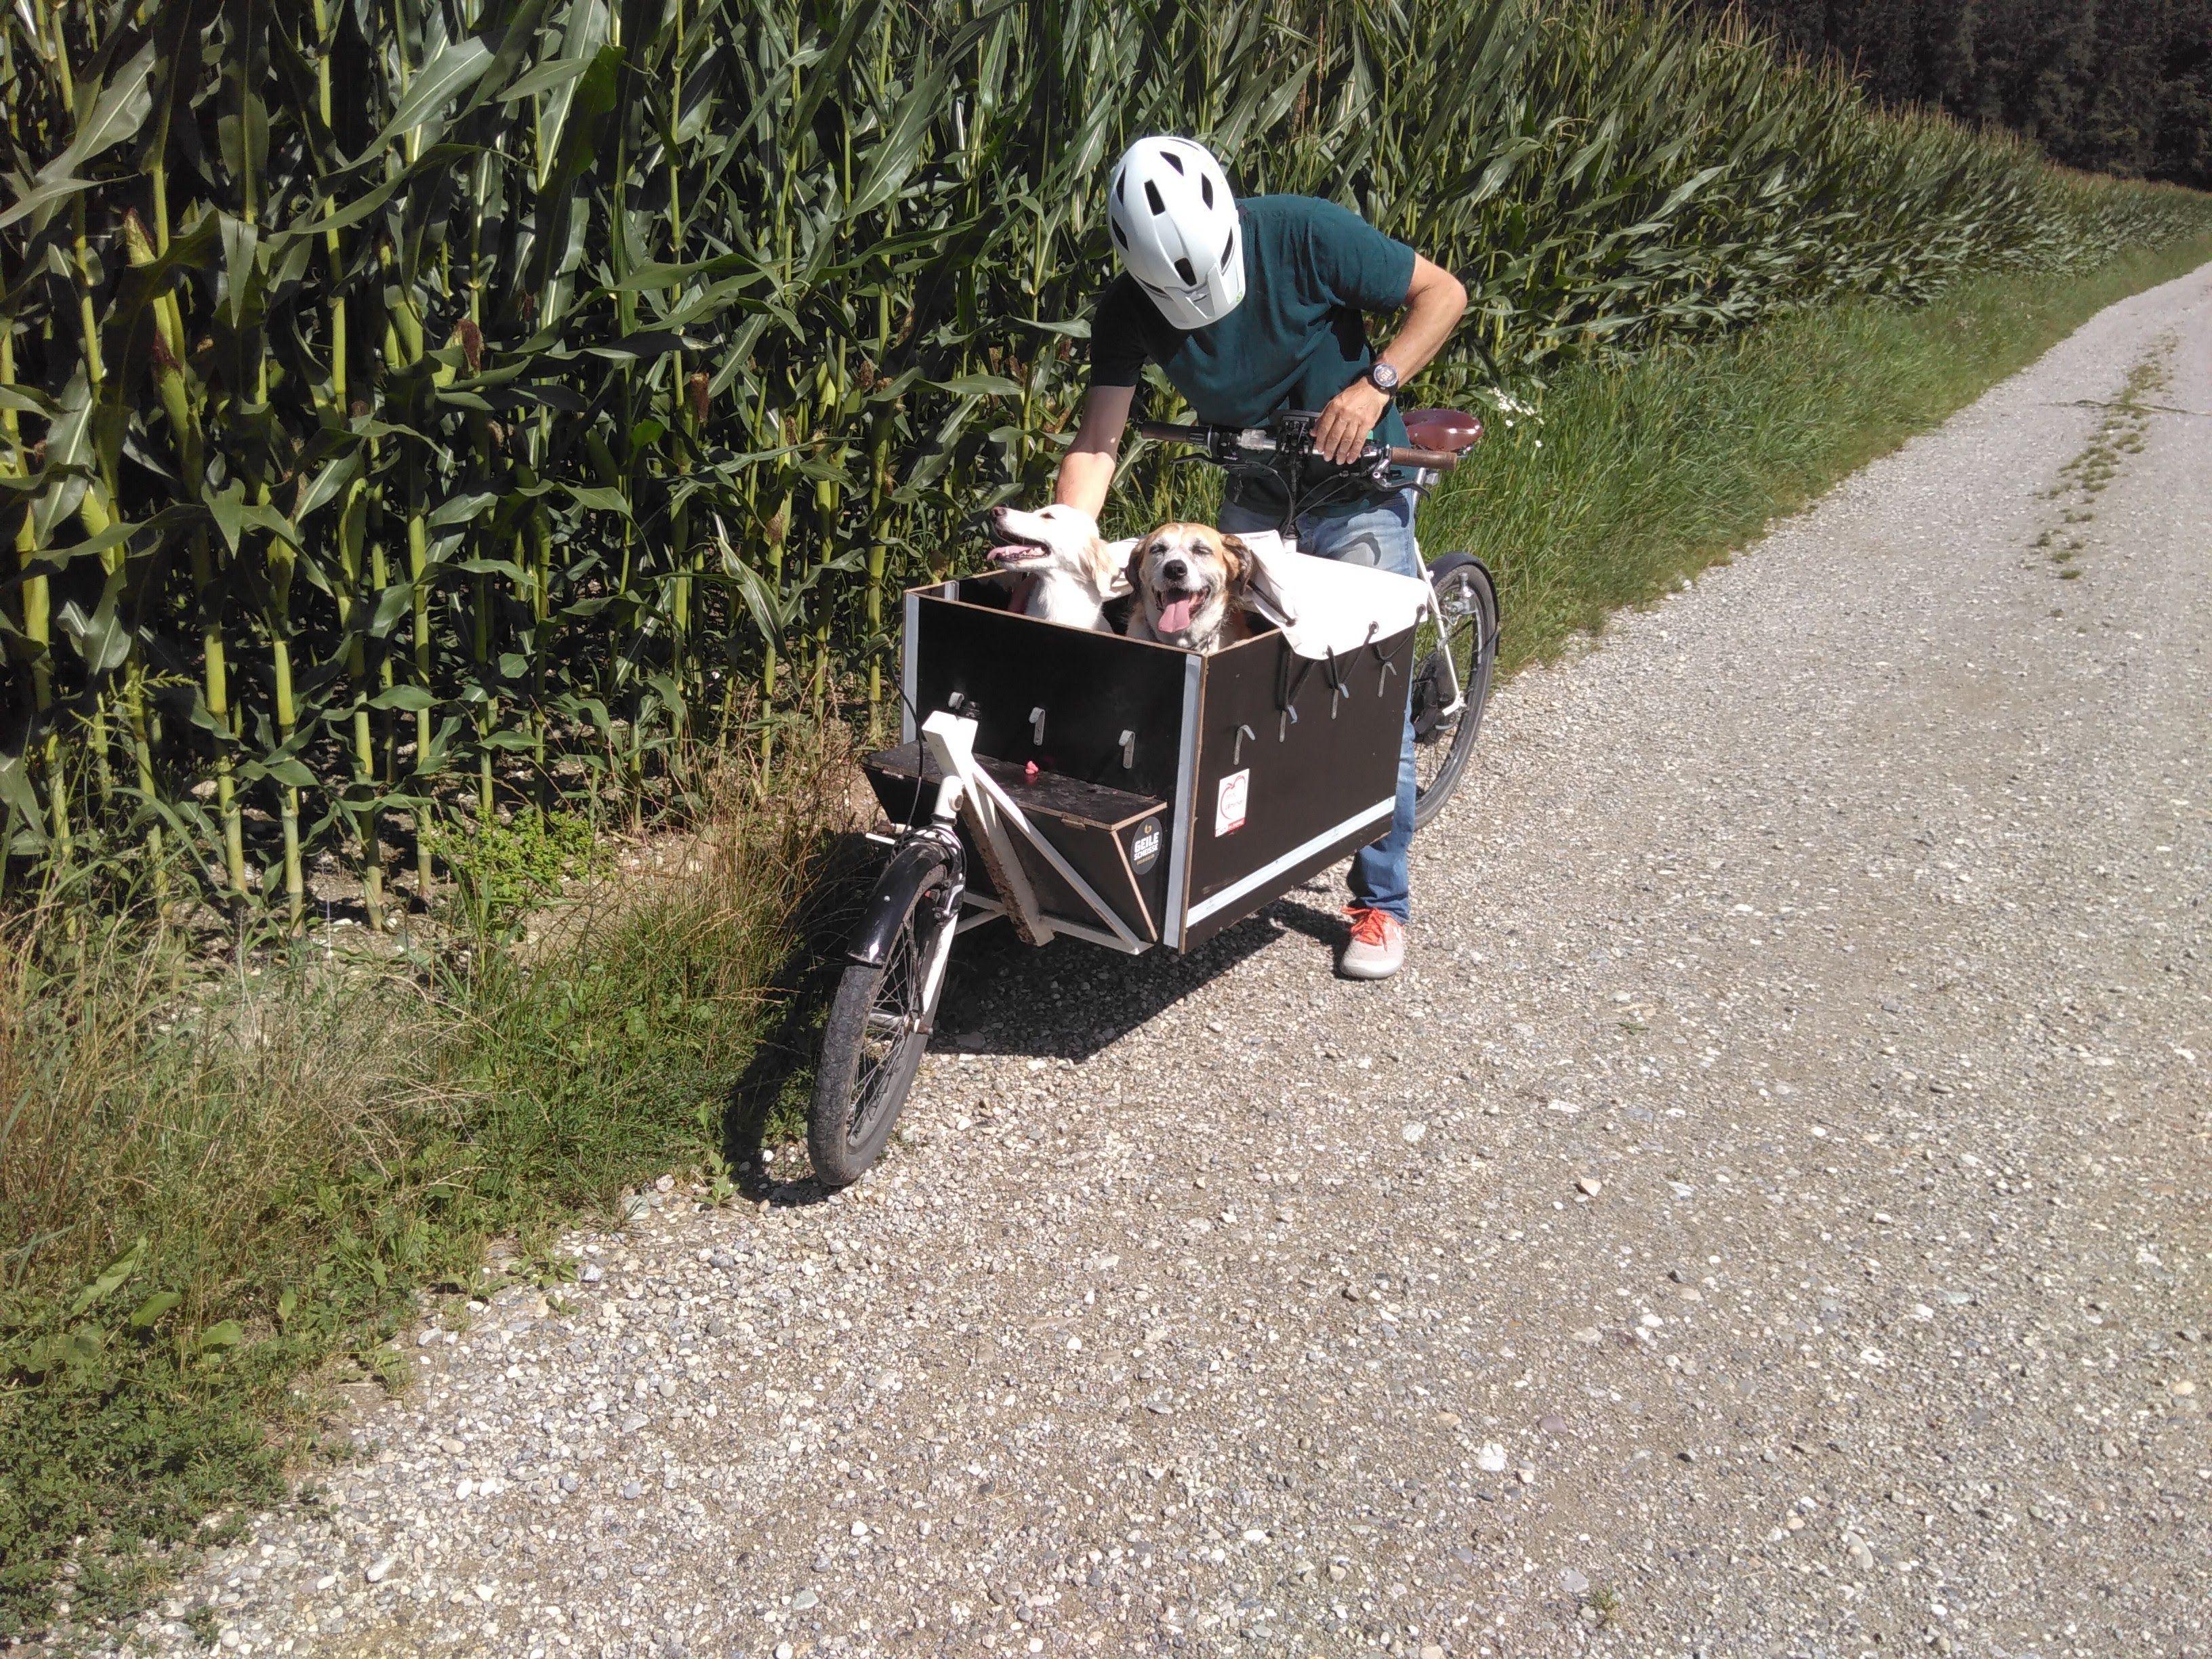 Cargobike - Upcycling